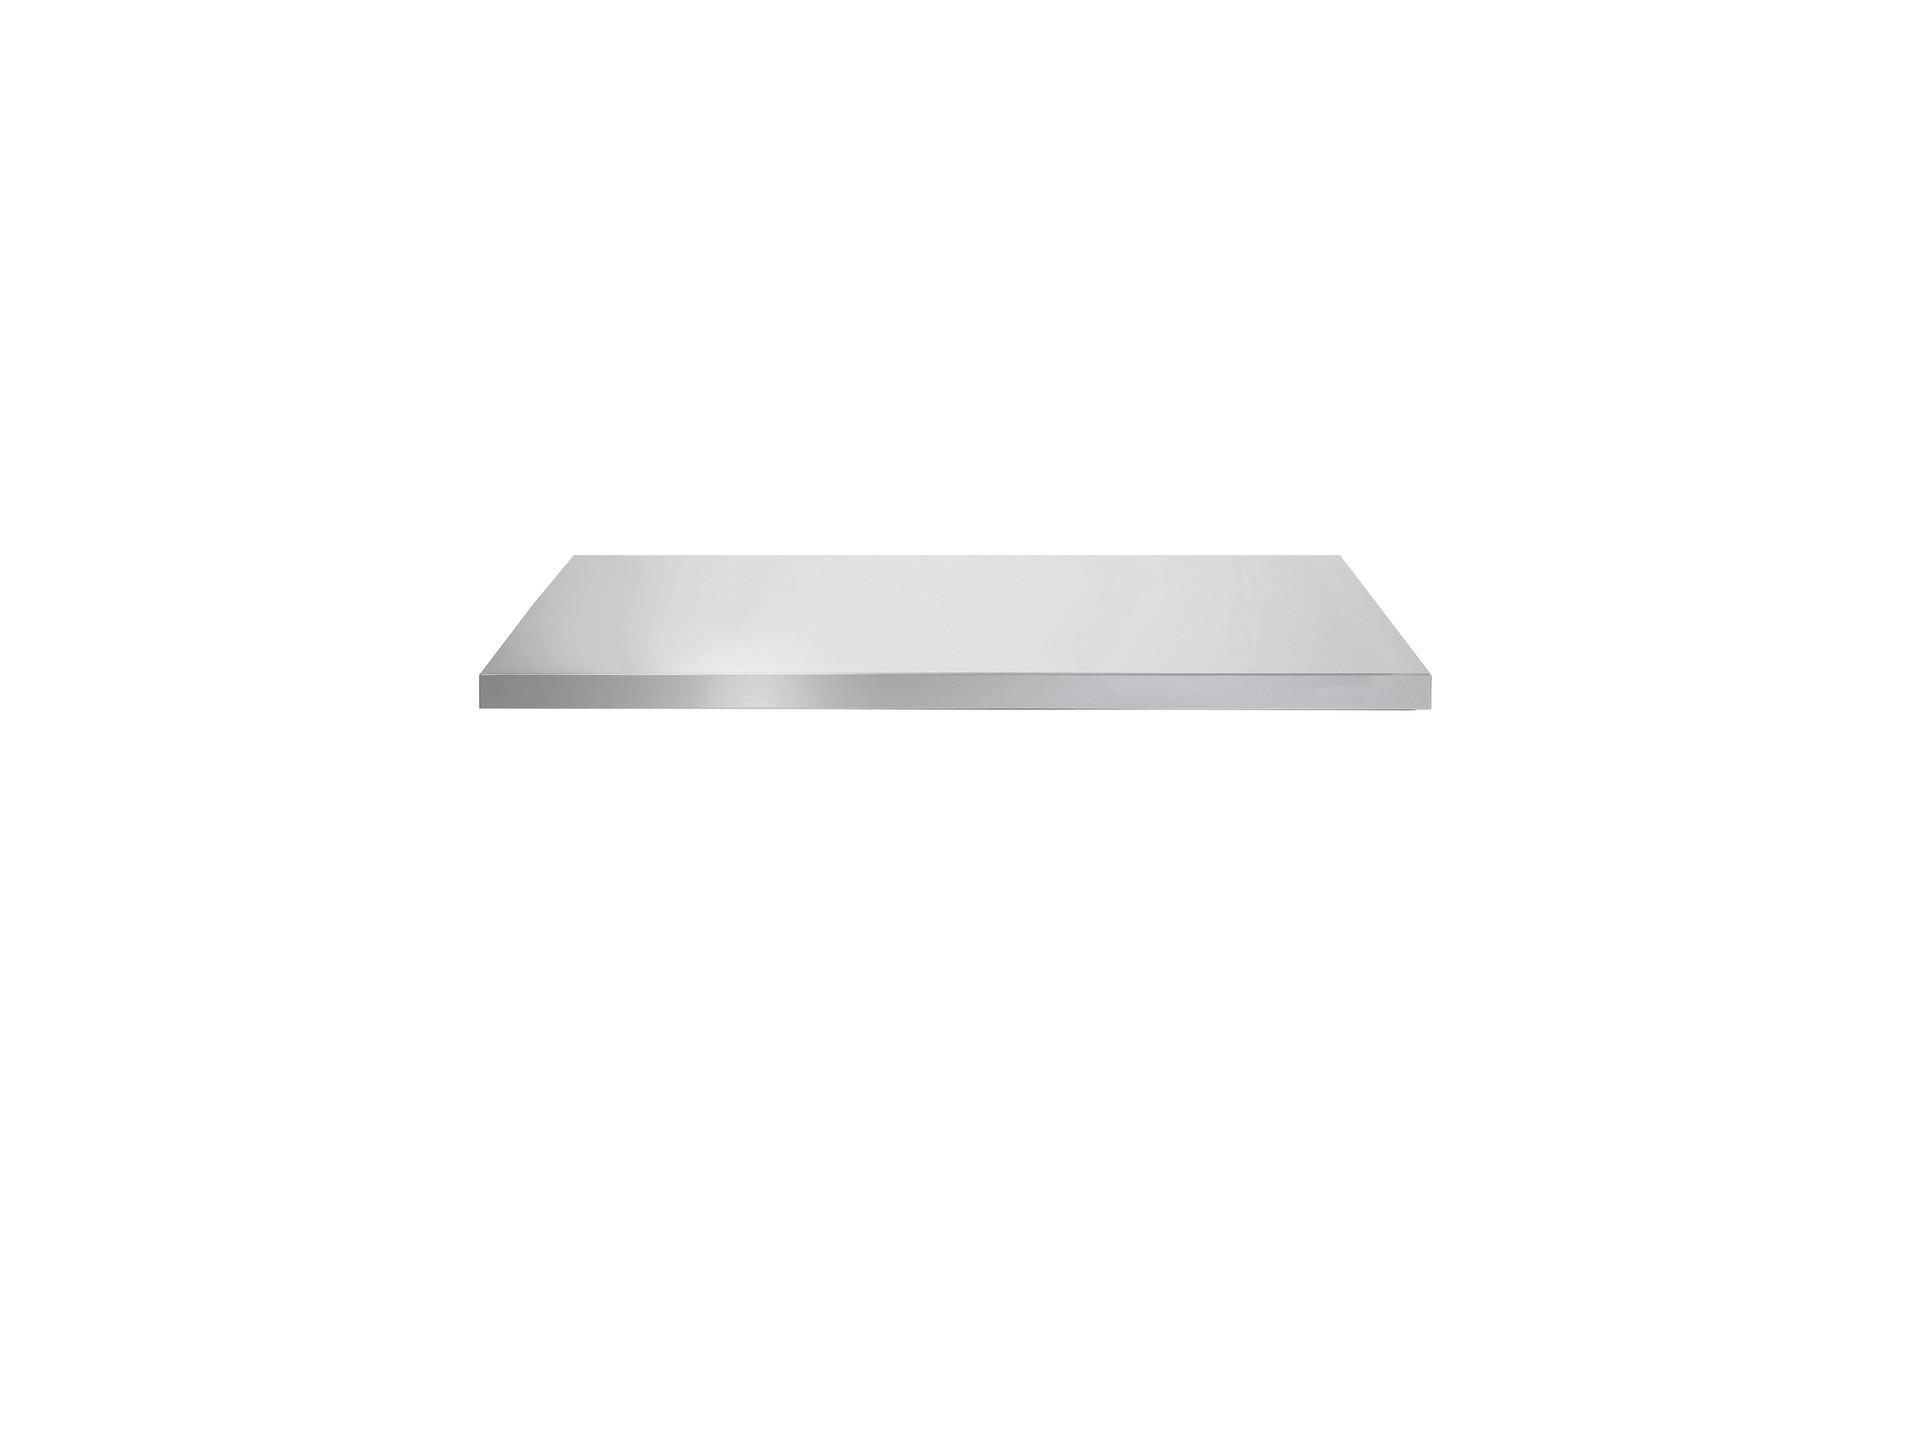 arbeitsplatte f k hltisch 1300 x 700 mm ohne aufkantung wolf gastro shop. Black Bedroom Furniture Sets. Home Design Ideas